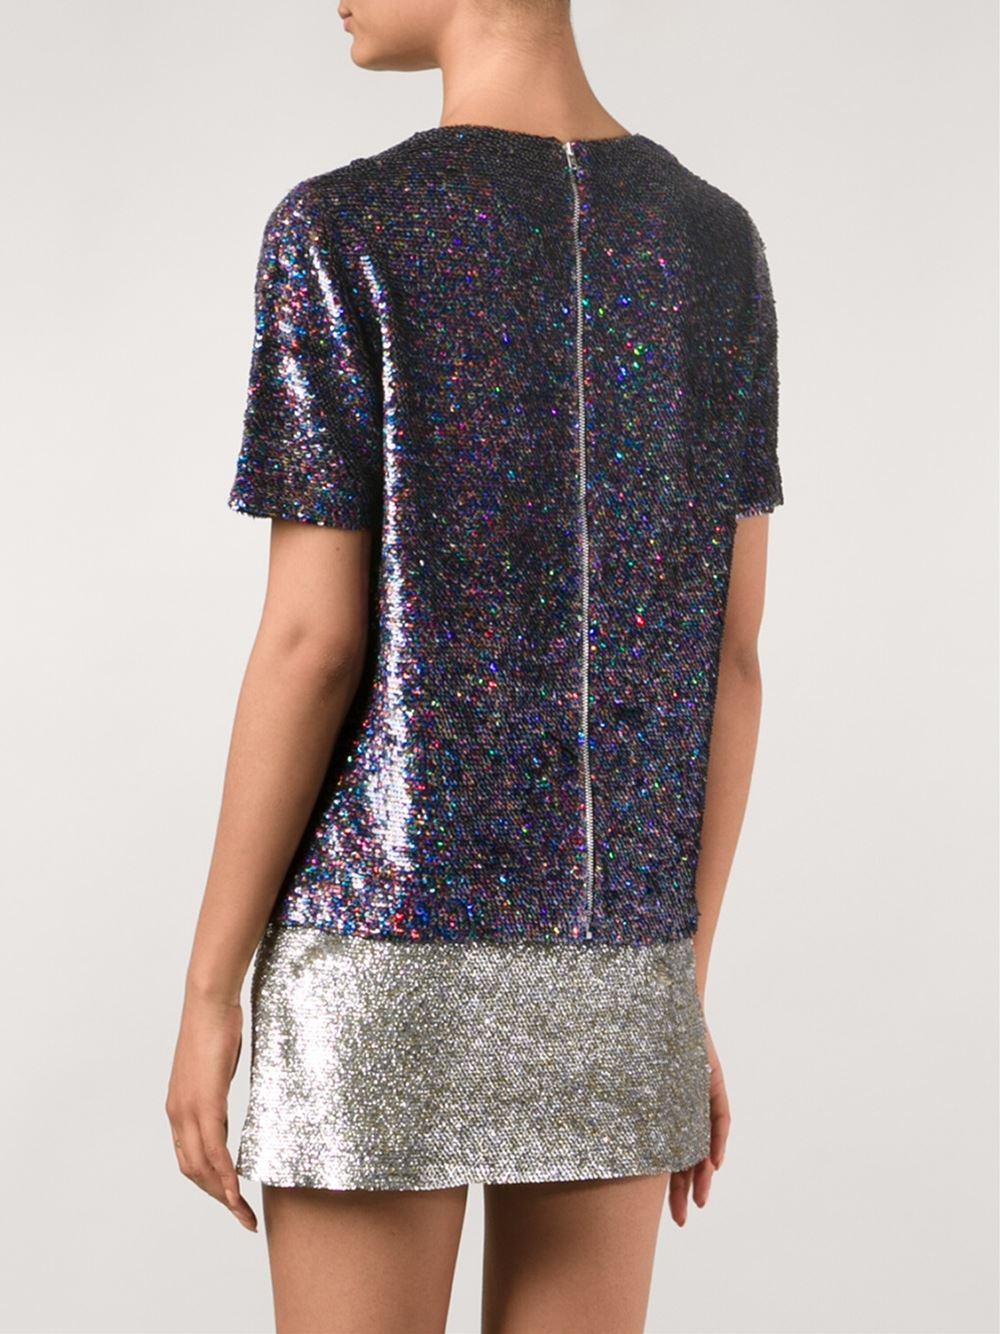 Ashish joyful sequin t shirt in multicolor multicolour for Sequin t shirt changing